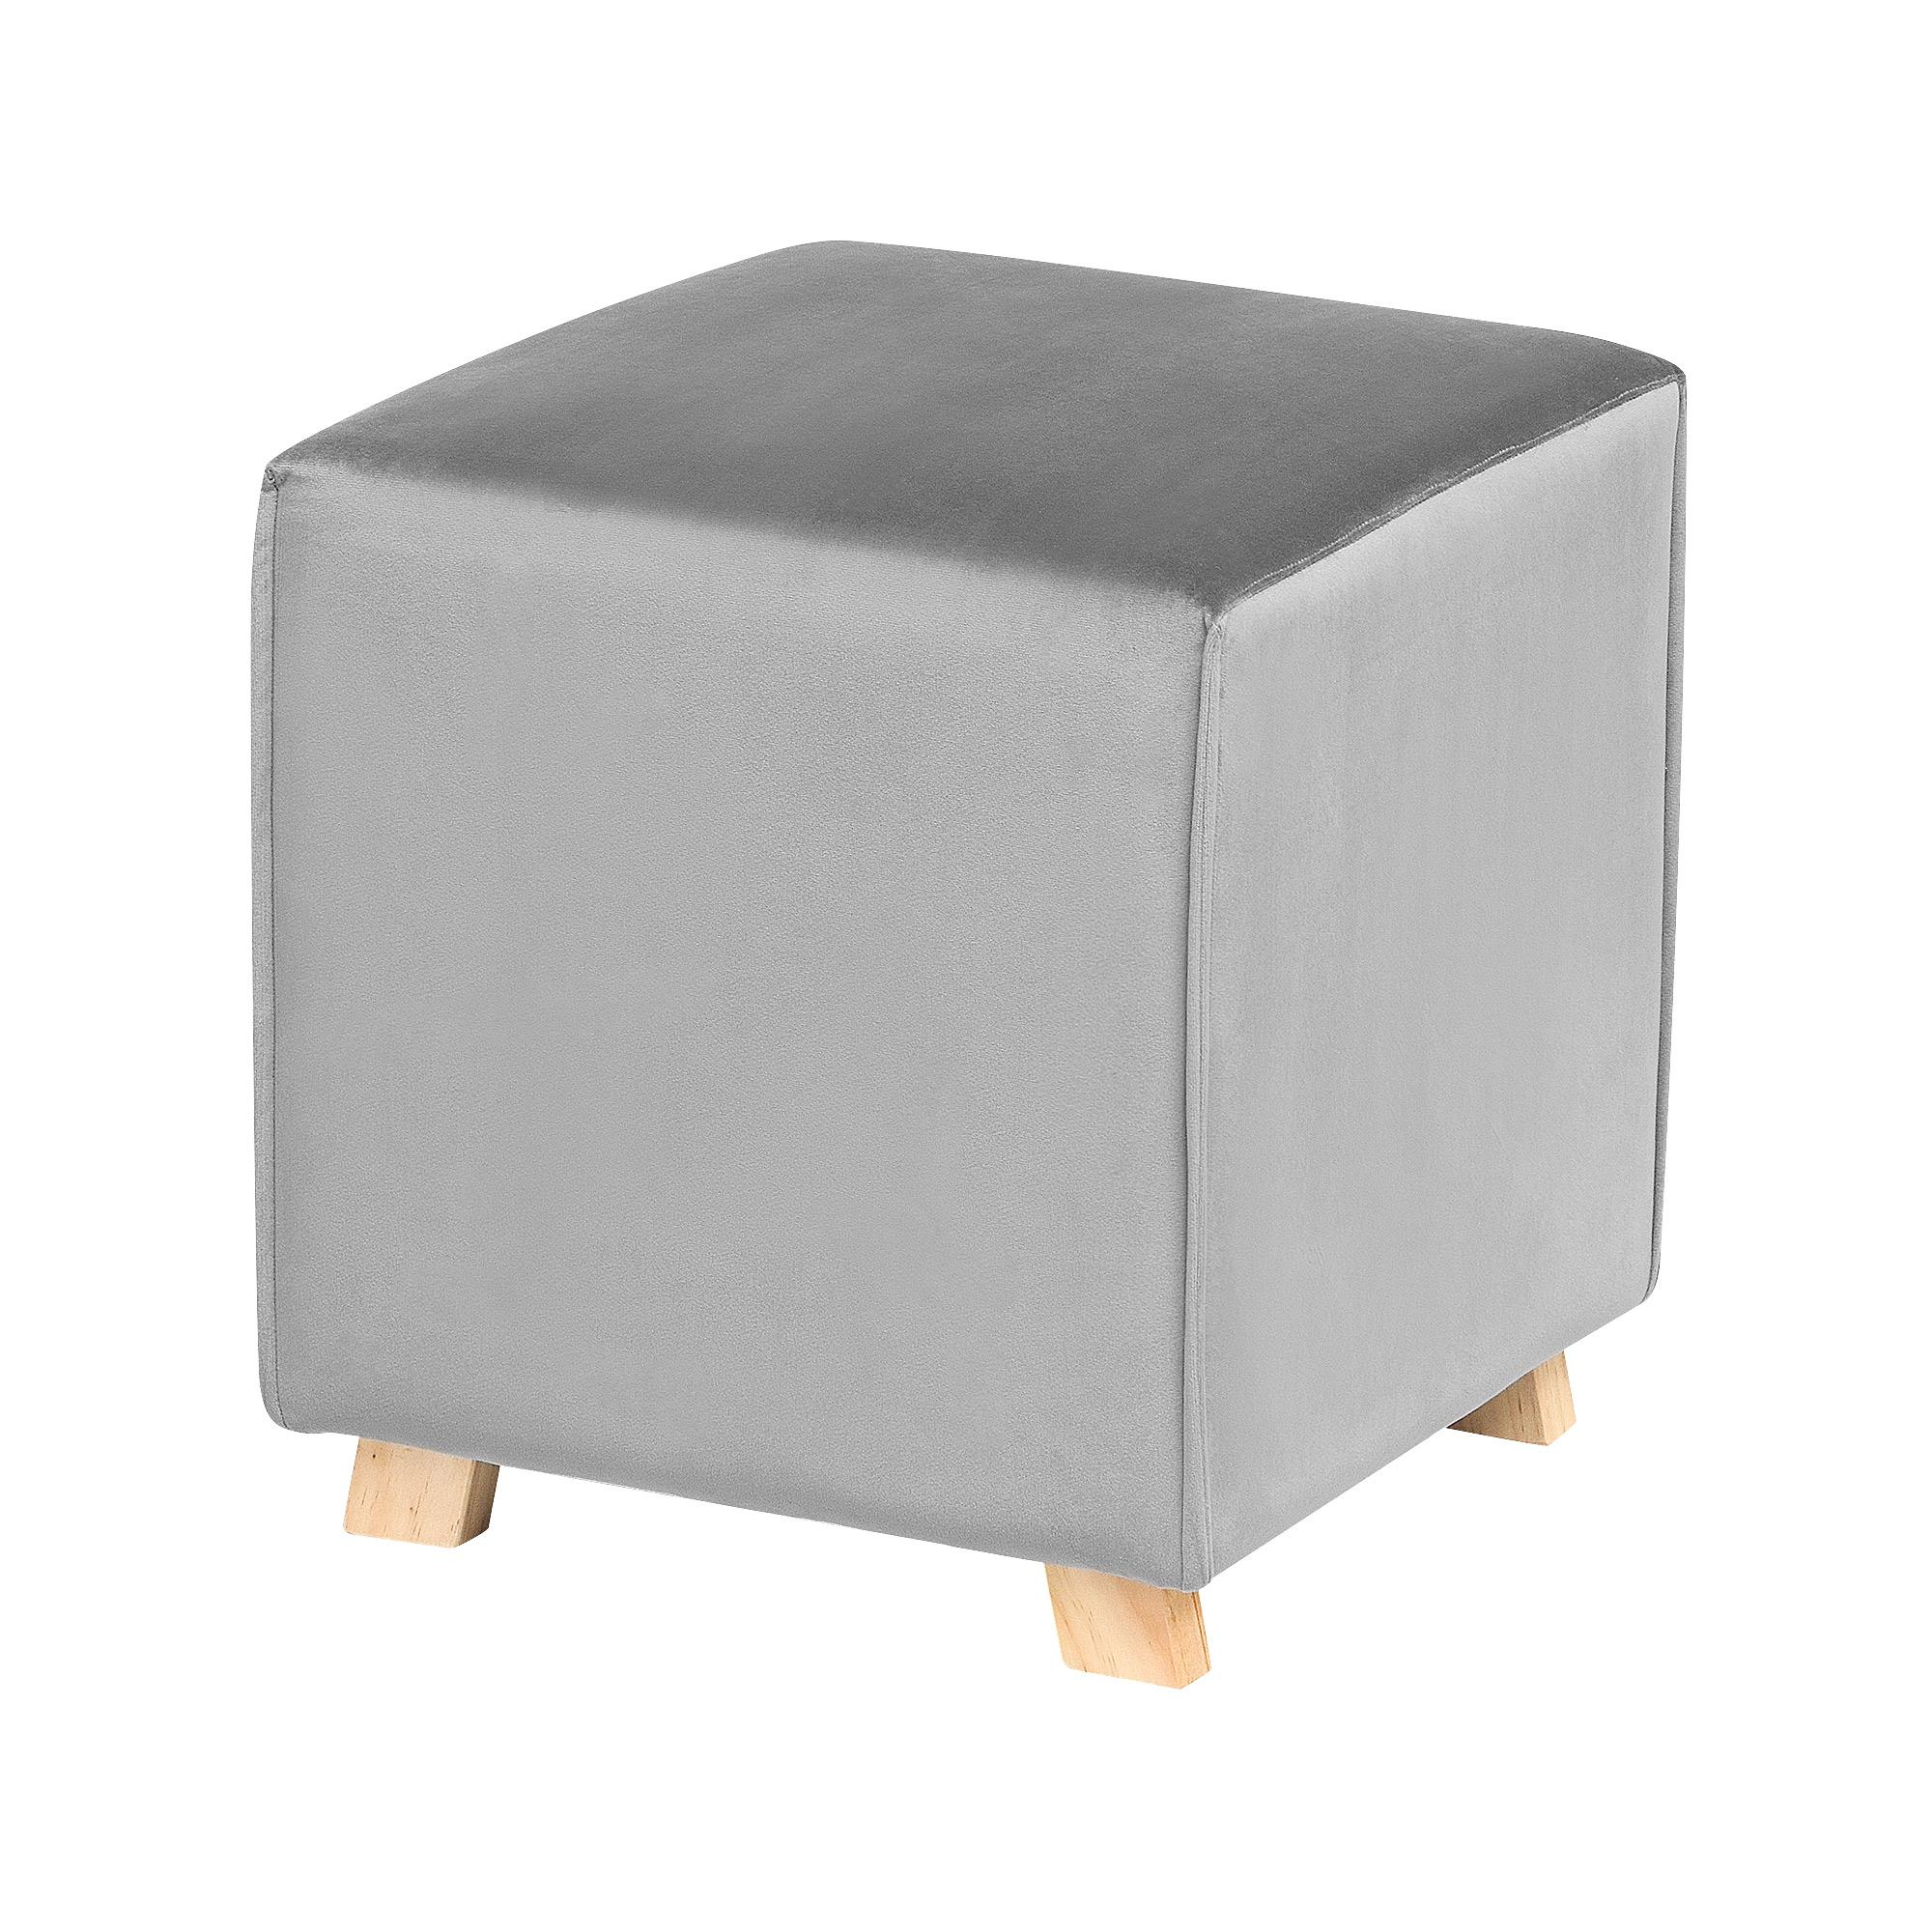 Пуф Bizzotto furniture Adeline серый